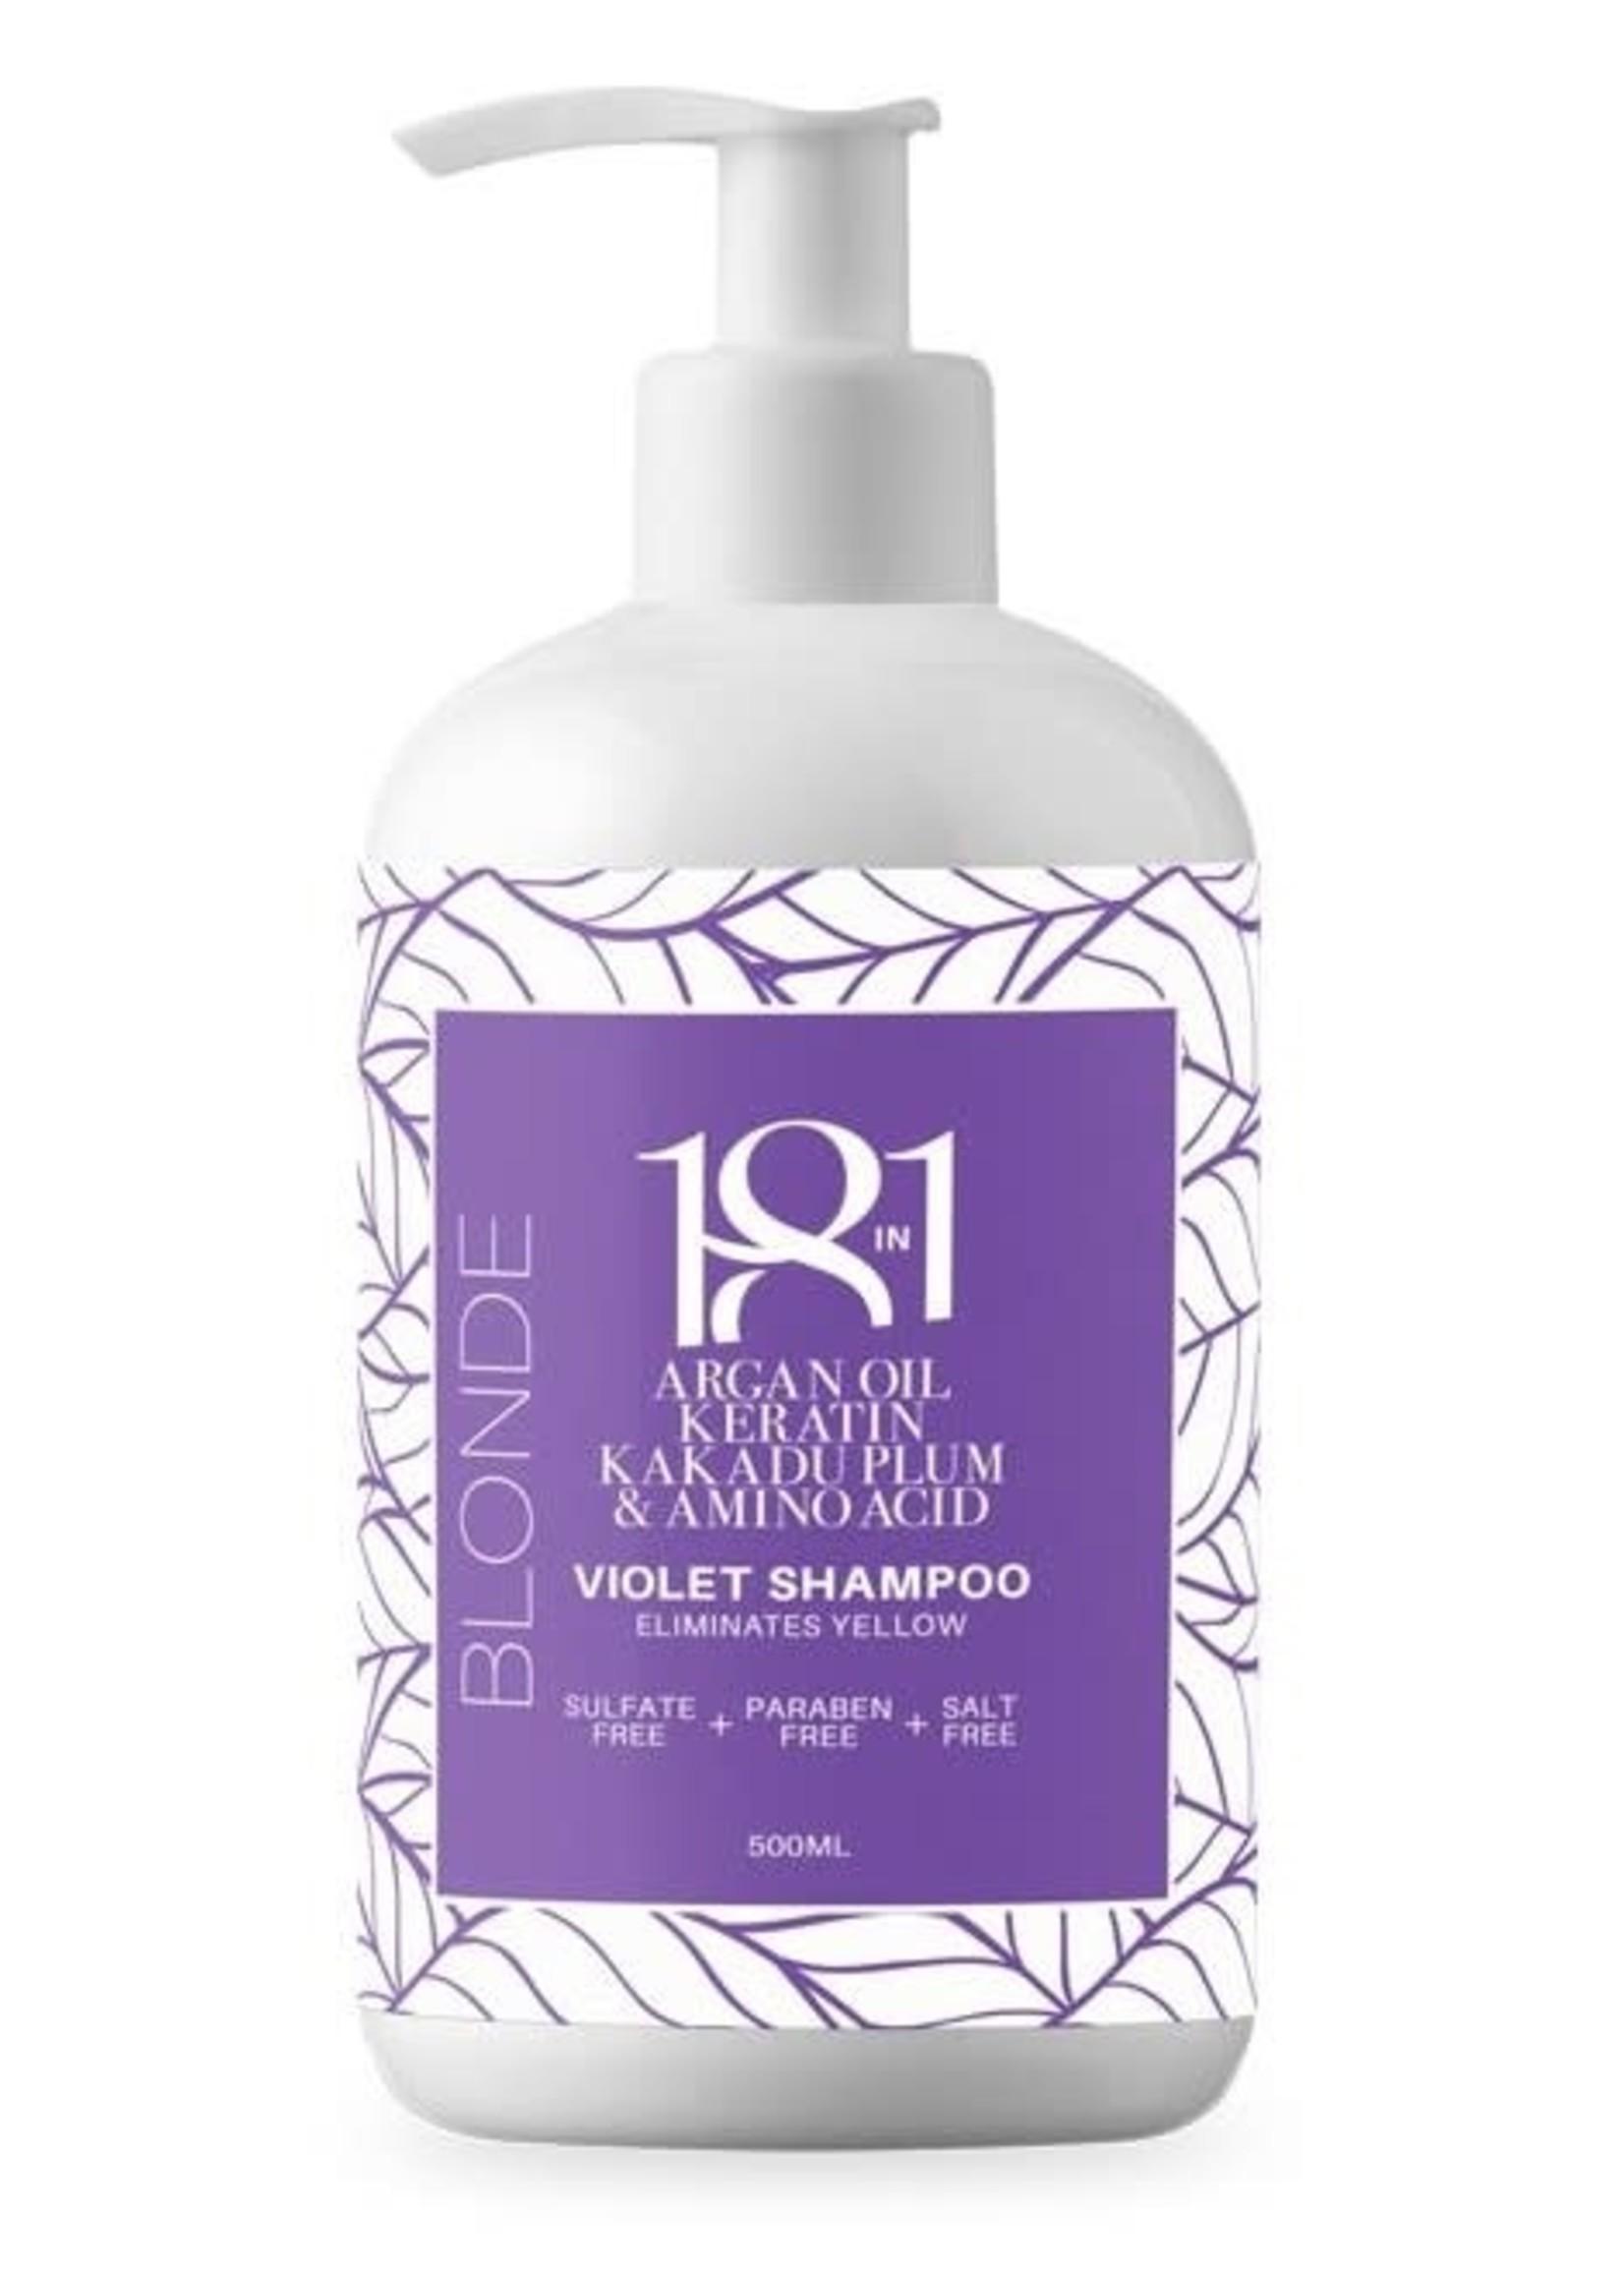 18 in 1 Blonde Violet Shampoo 500ml